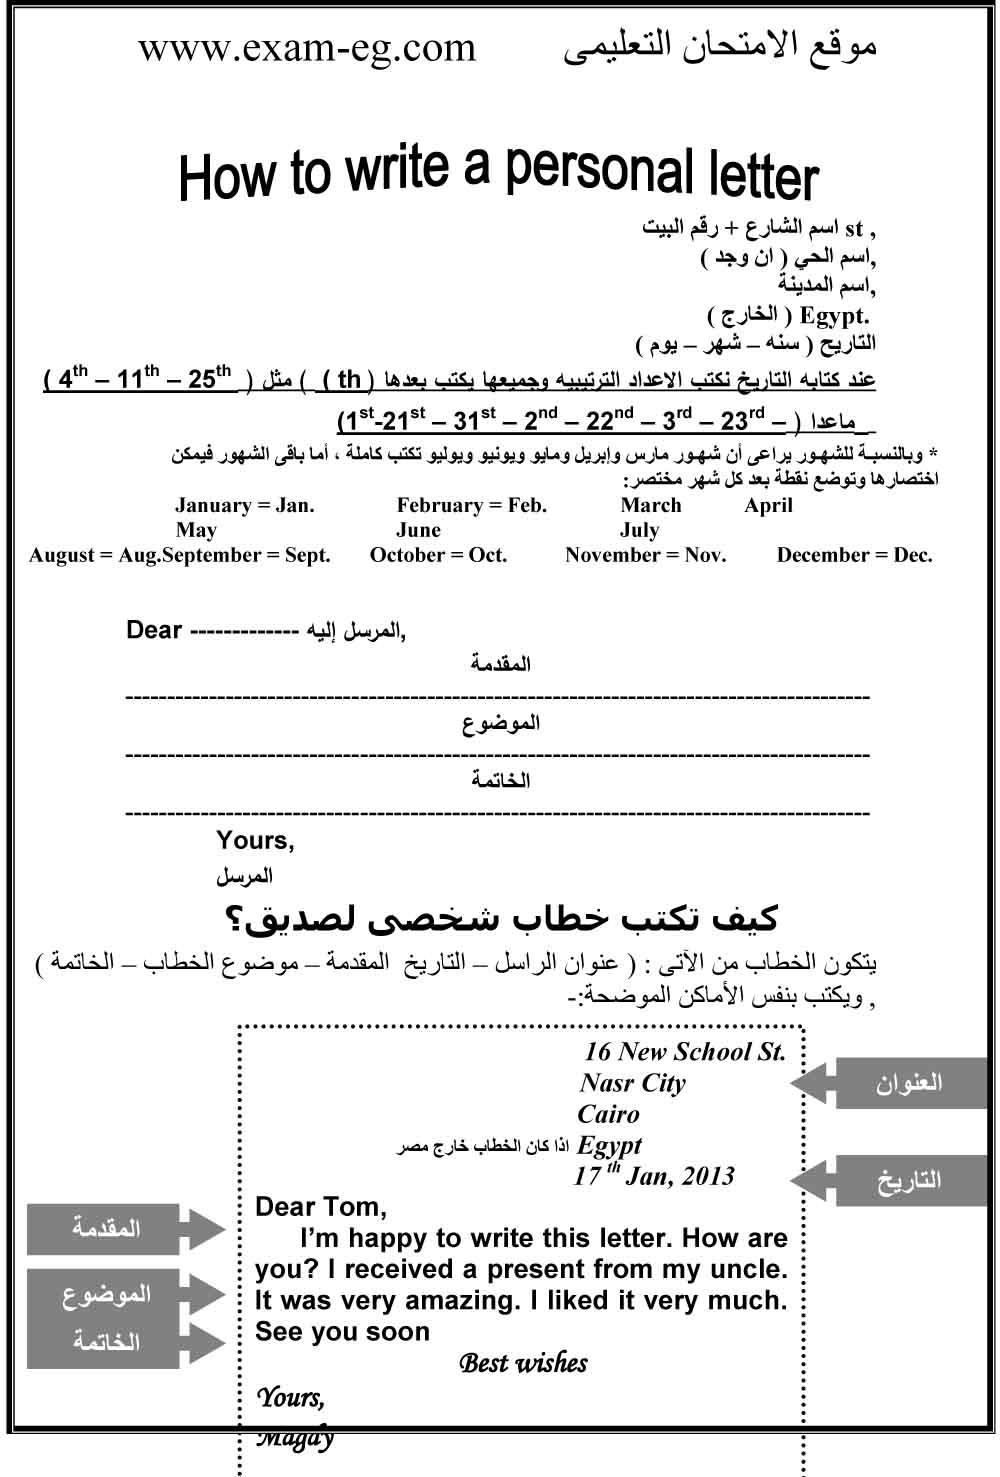 exam-eg.com_1453833580452.jpg